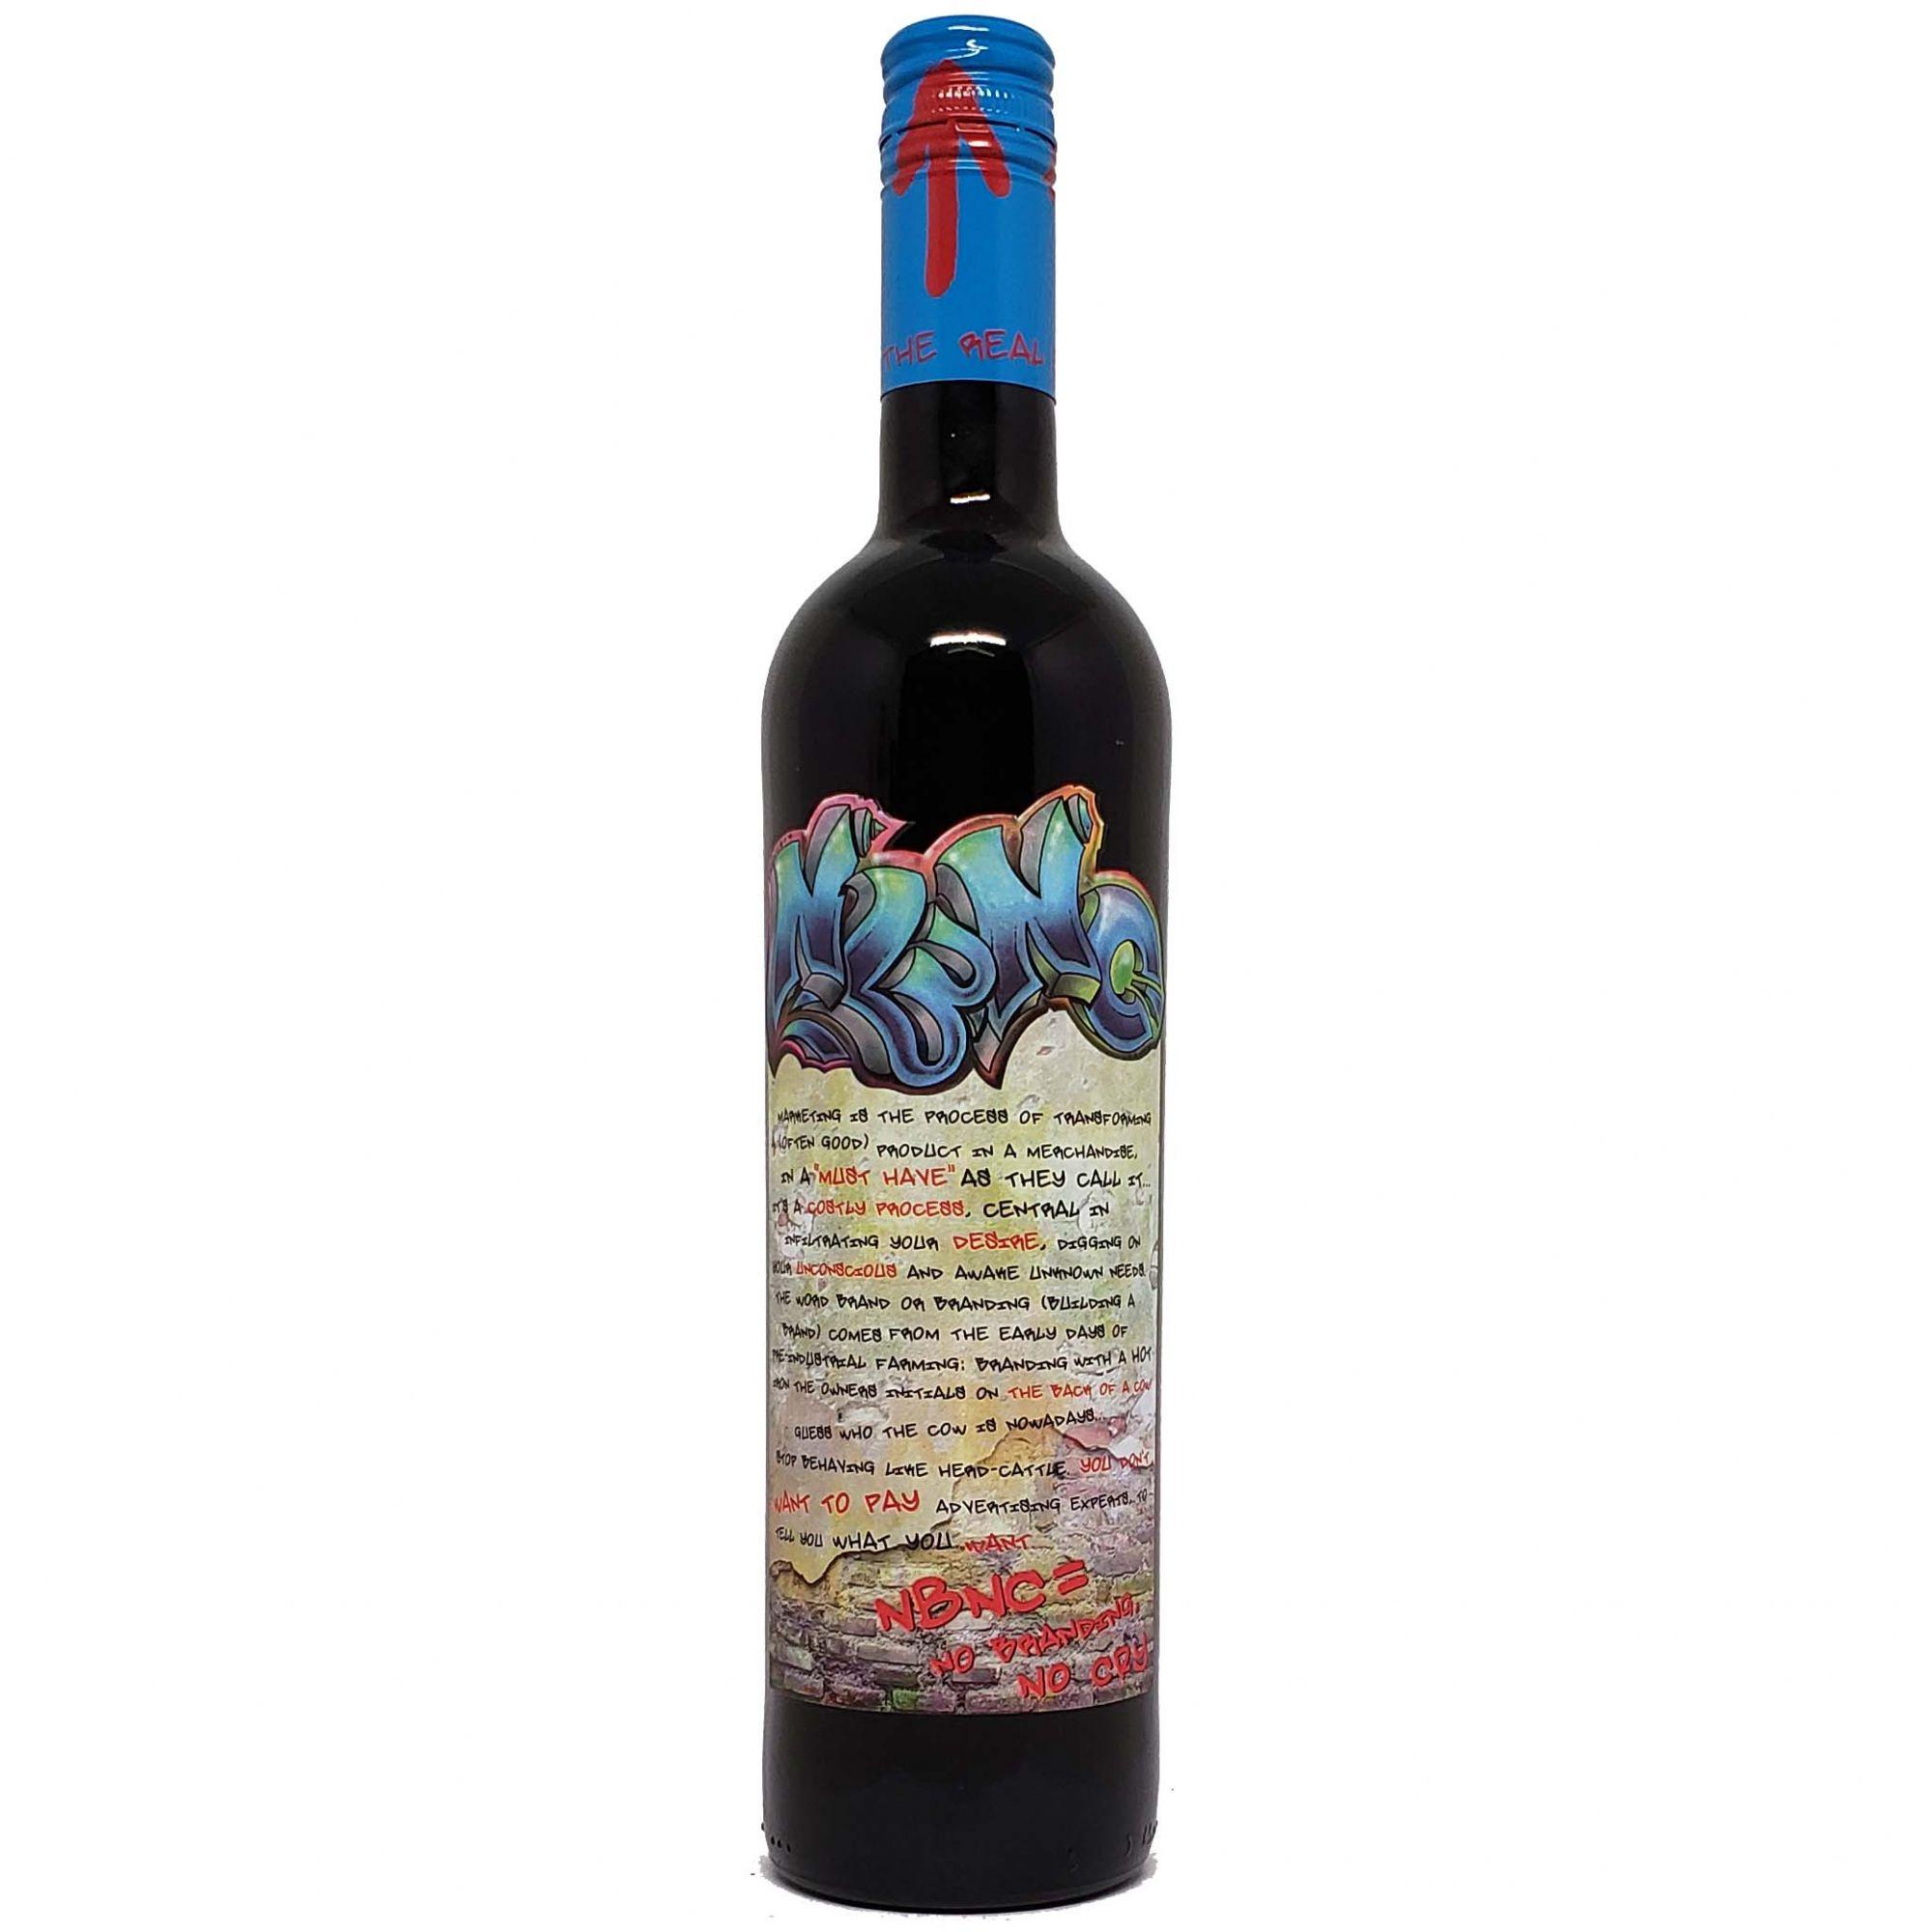 Vinho Tinto NBNC - 750ml -